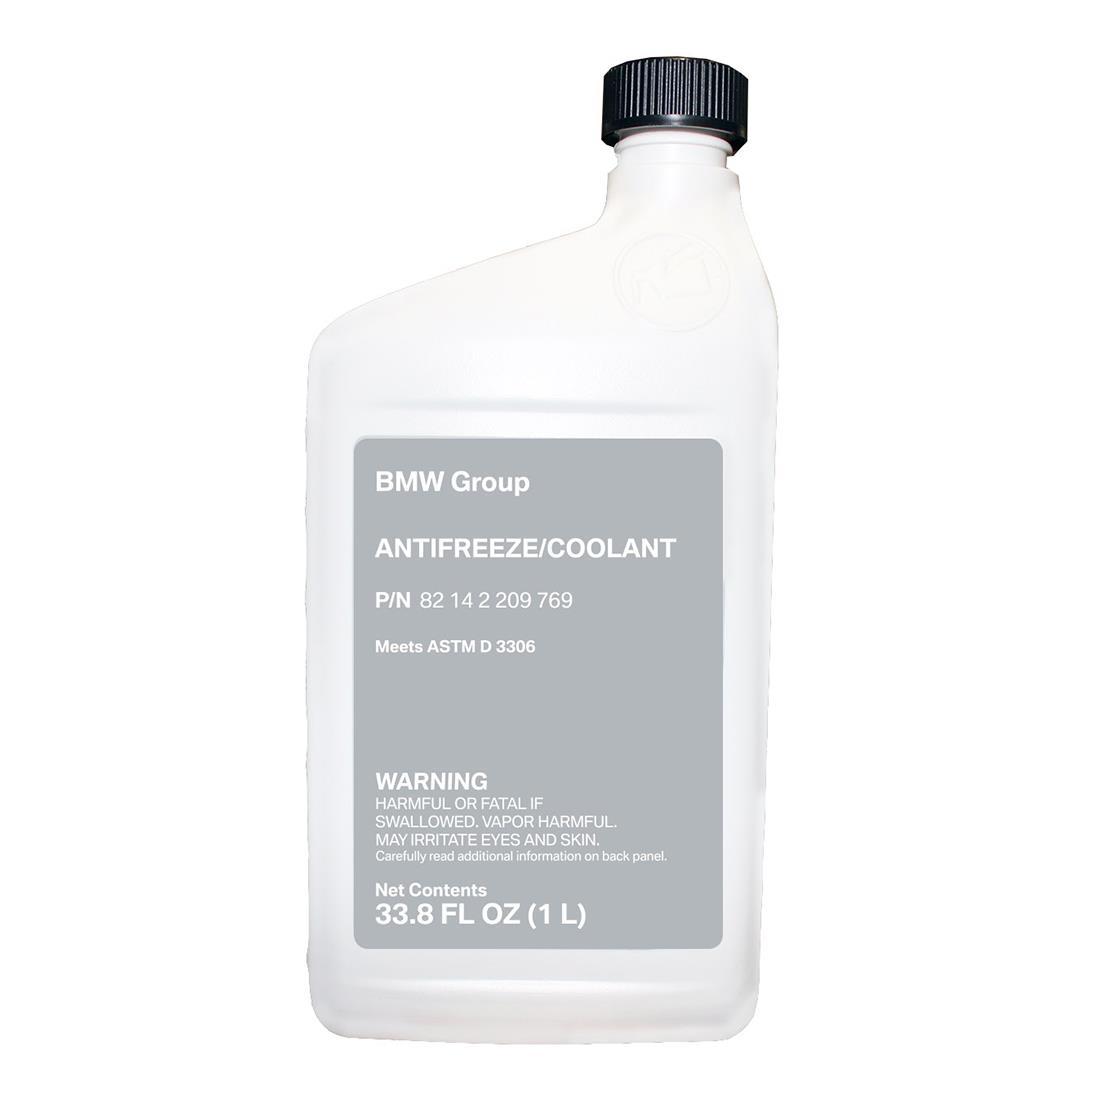 BMW Antifreeze/Coolant